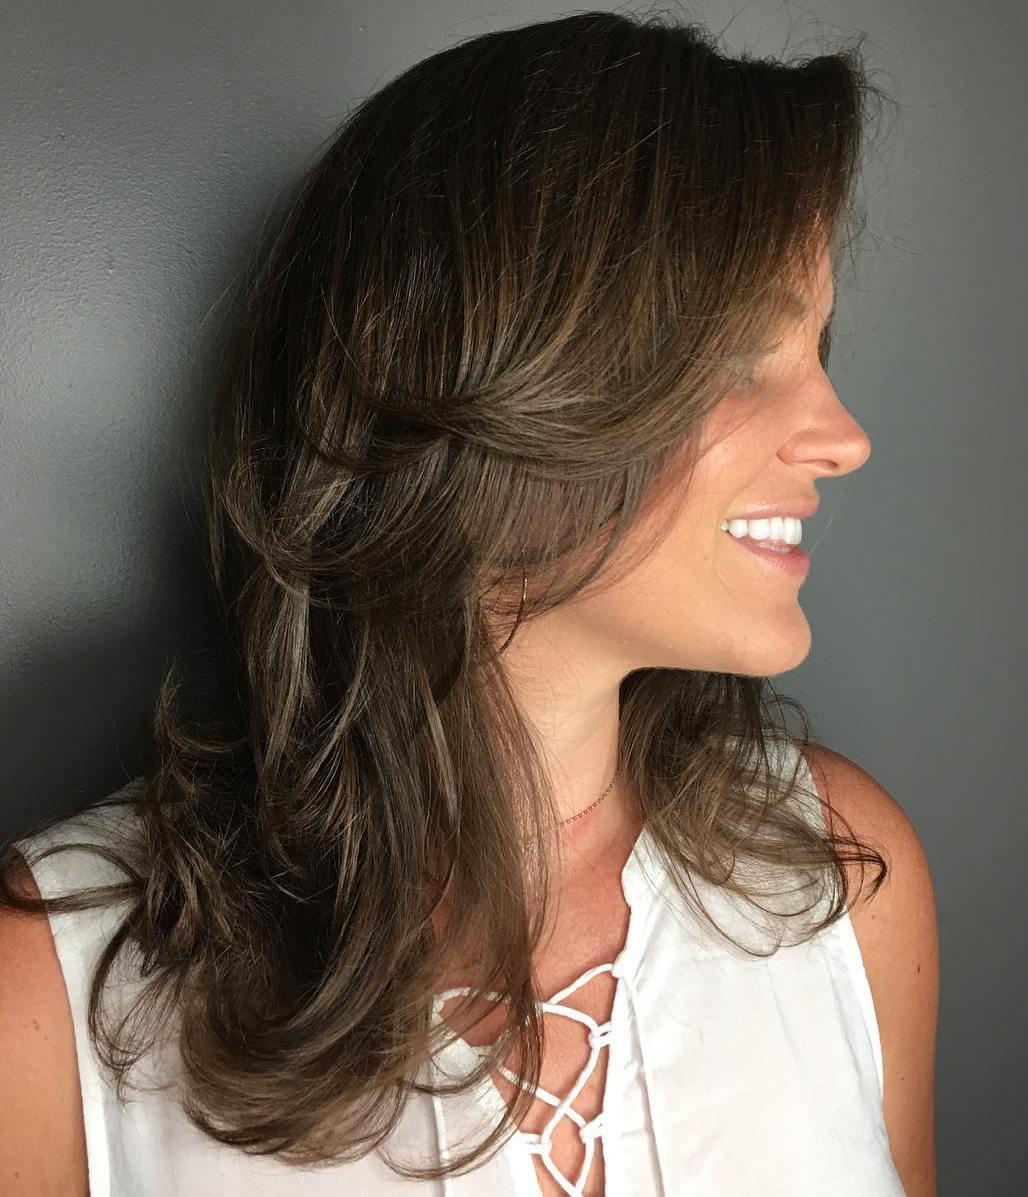 Shoulder Length Layered Haircut for Thin Hair